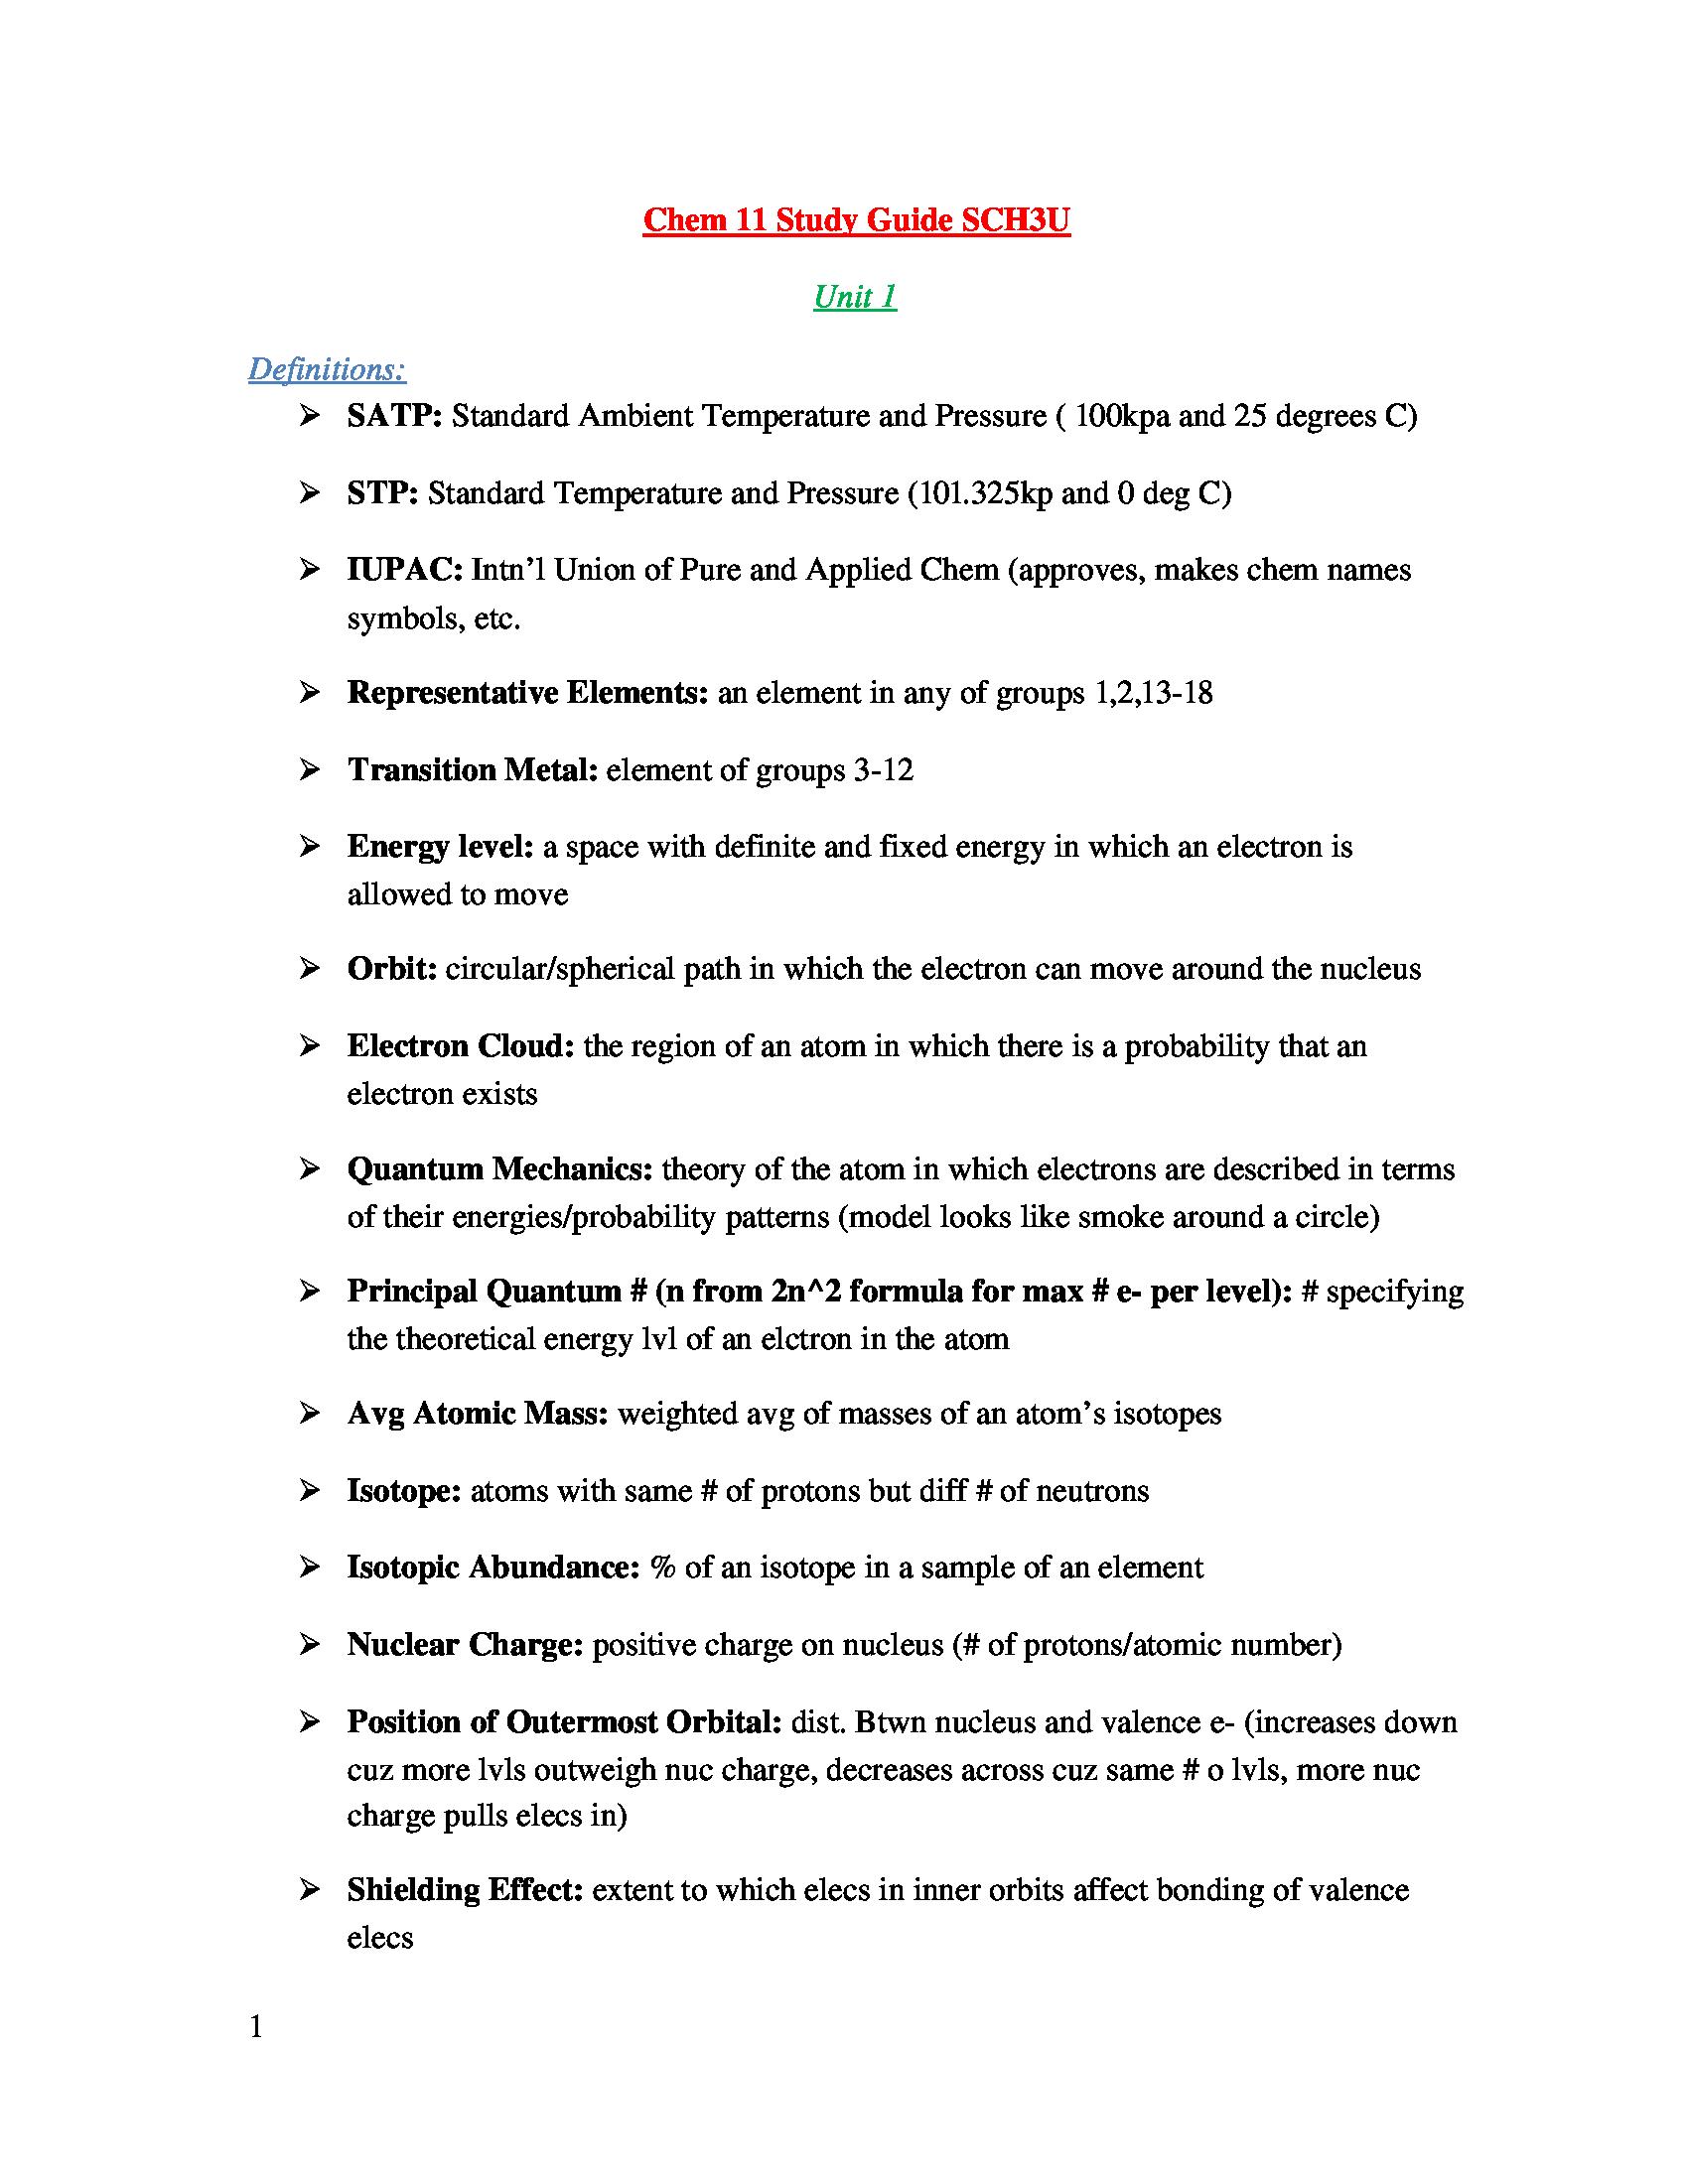 24731613 chemistry study guide notes for final exam sch3u grade 11 rh pinterest com siyavula physical science grade 11 teacher's guide science grade 11 teacher's guide